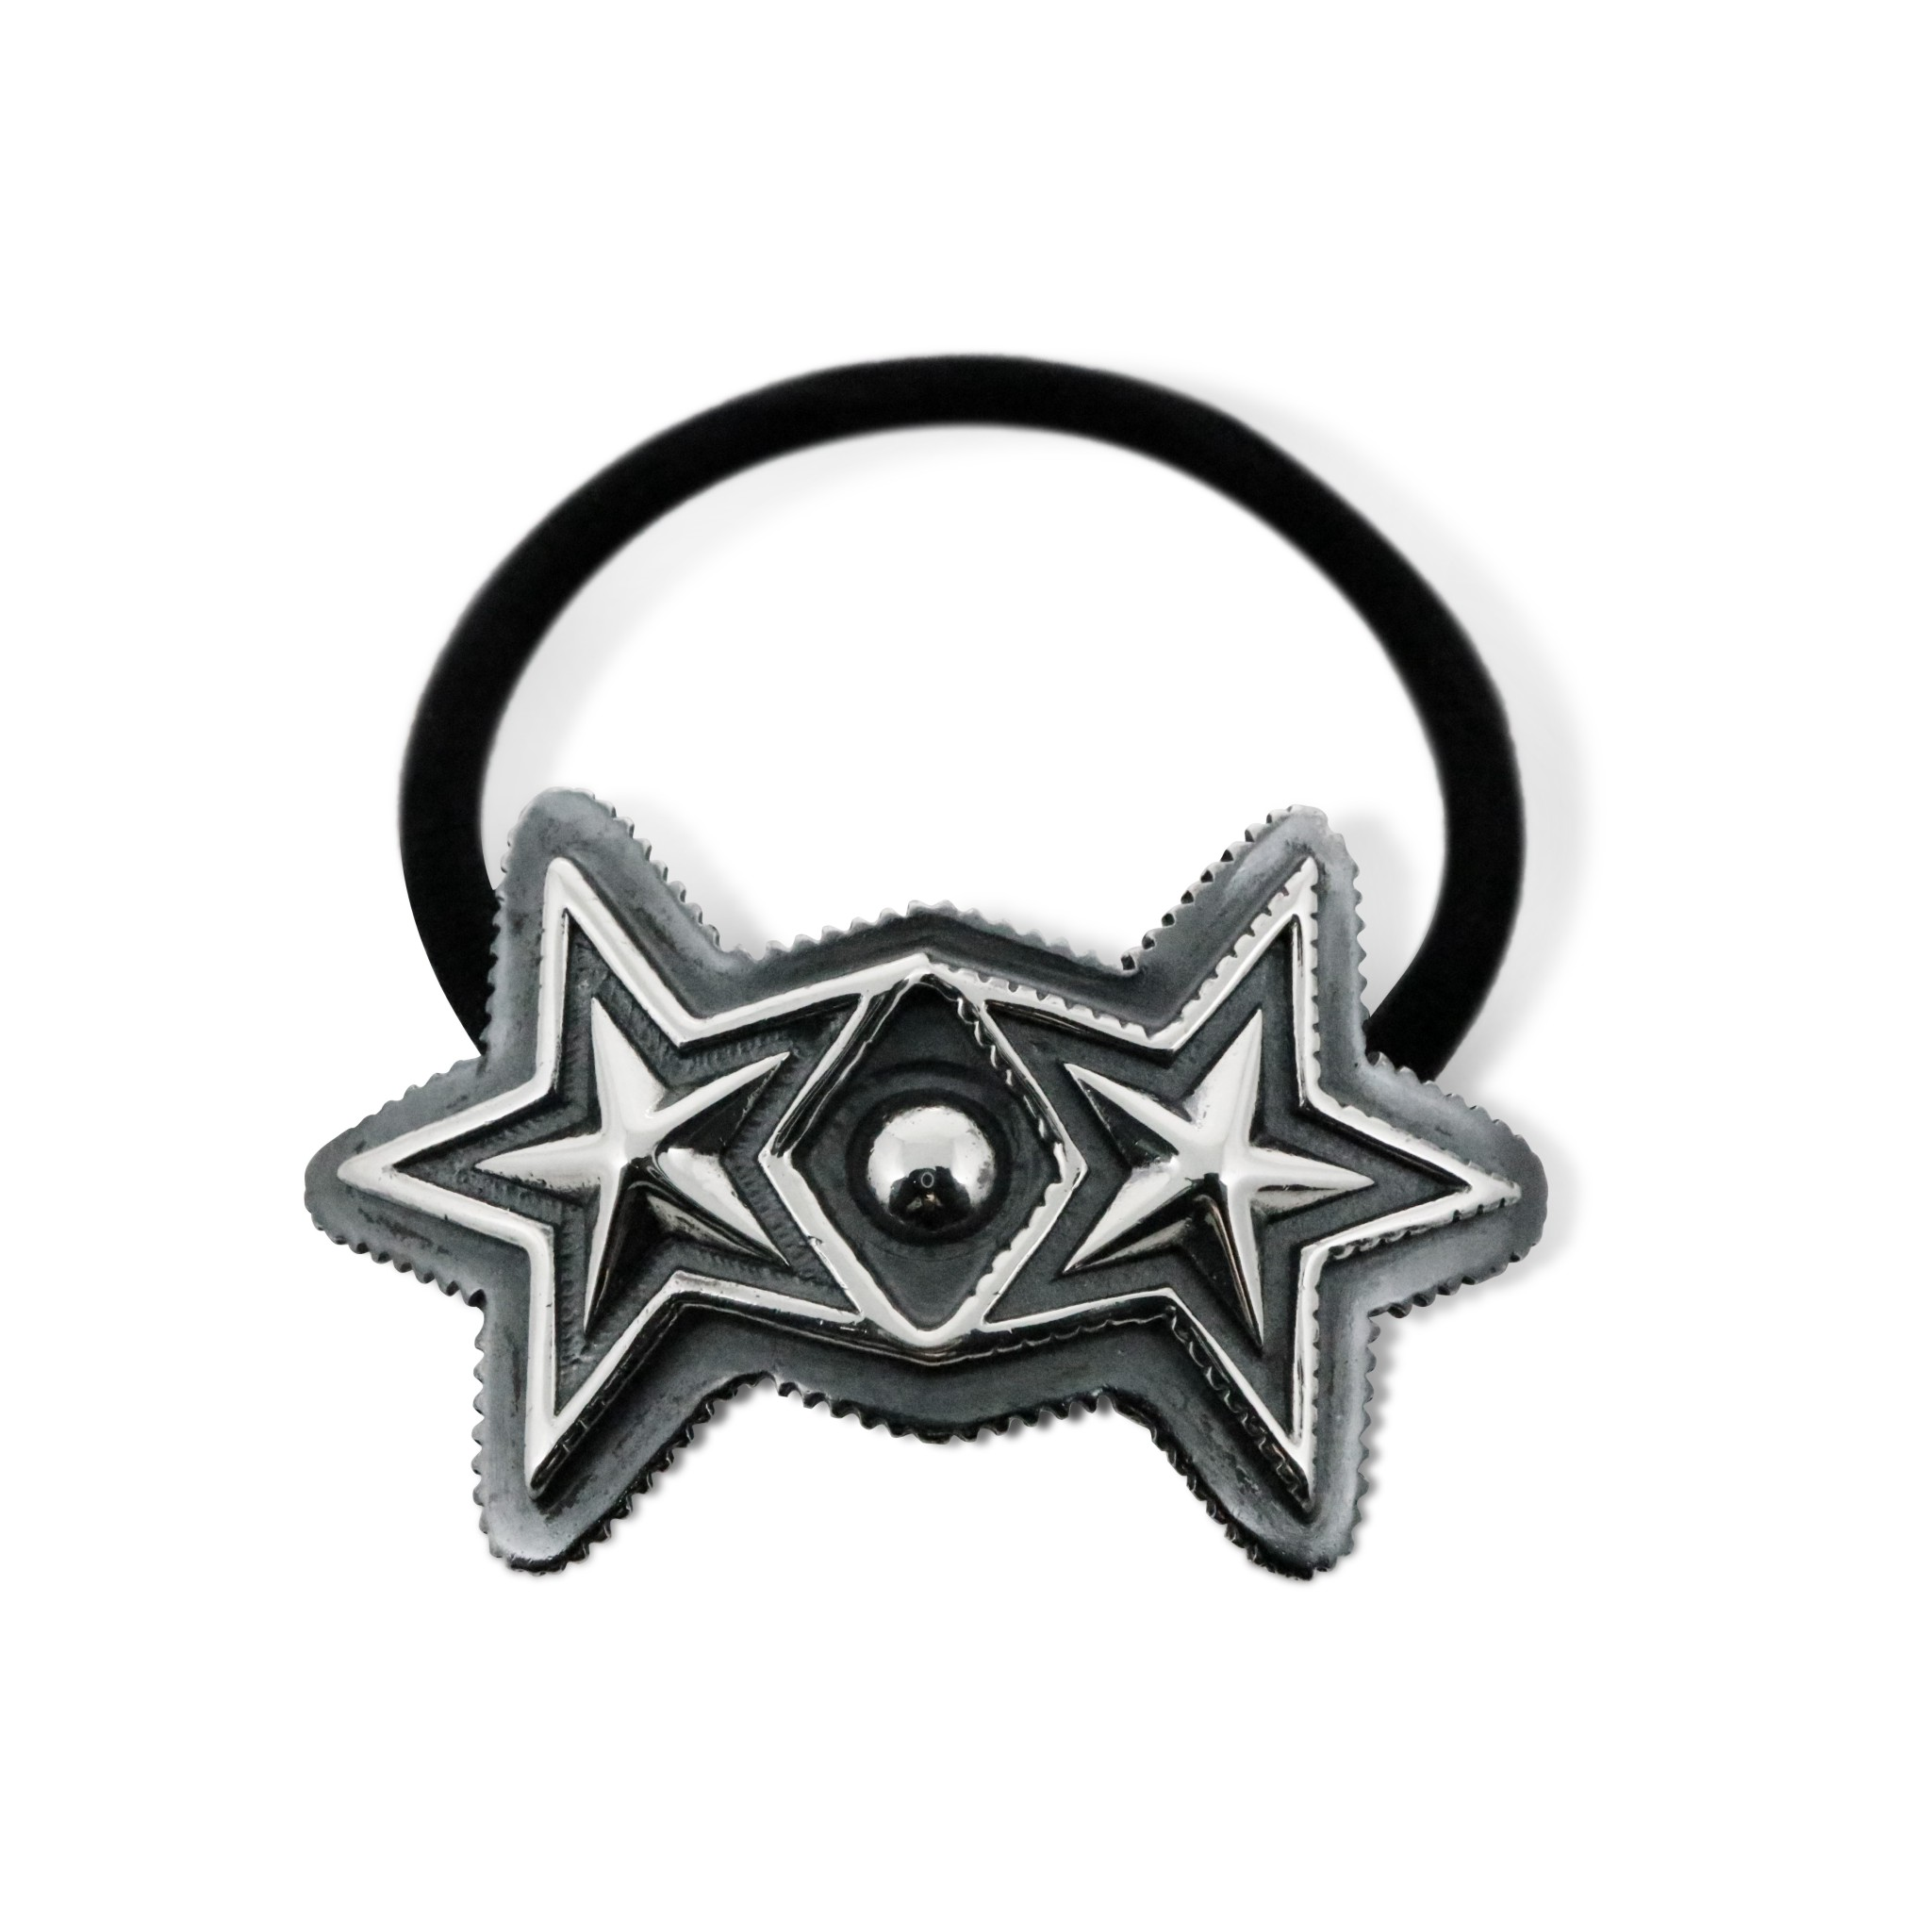 DOUBLE SHERIFF STAR HAIR TIE  [USD $660]